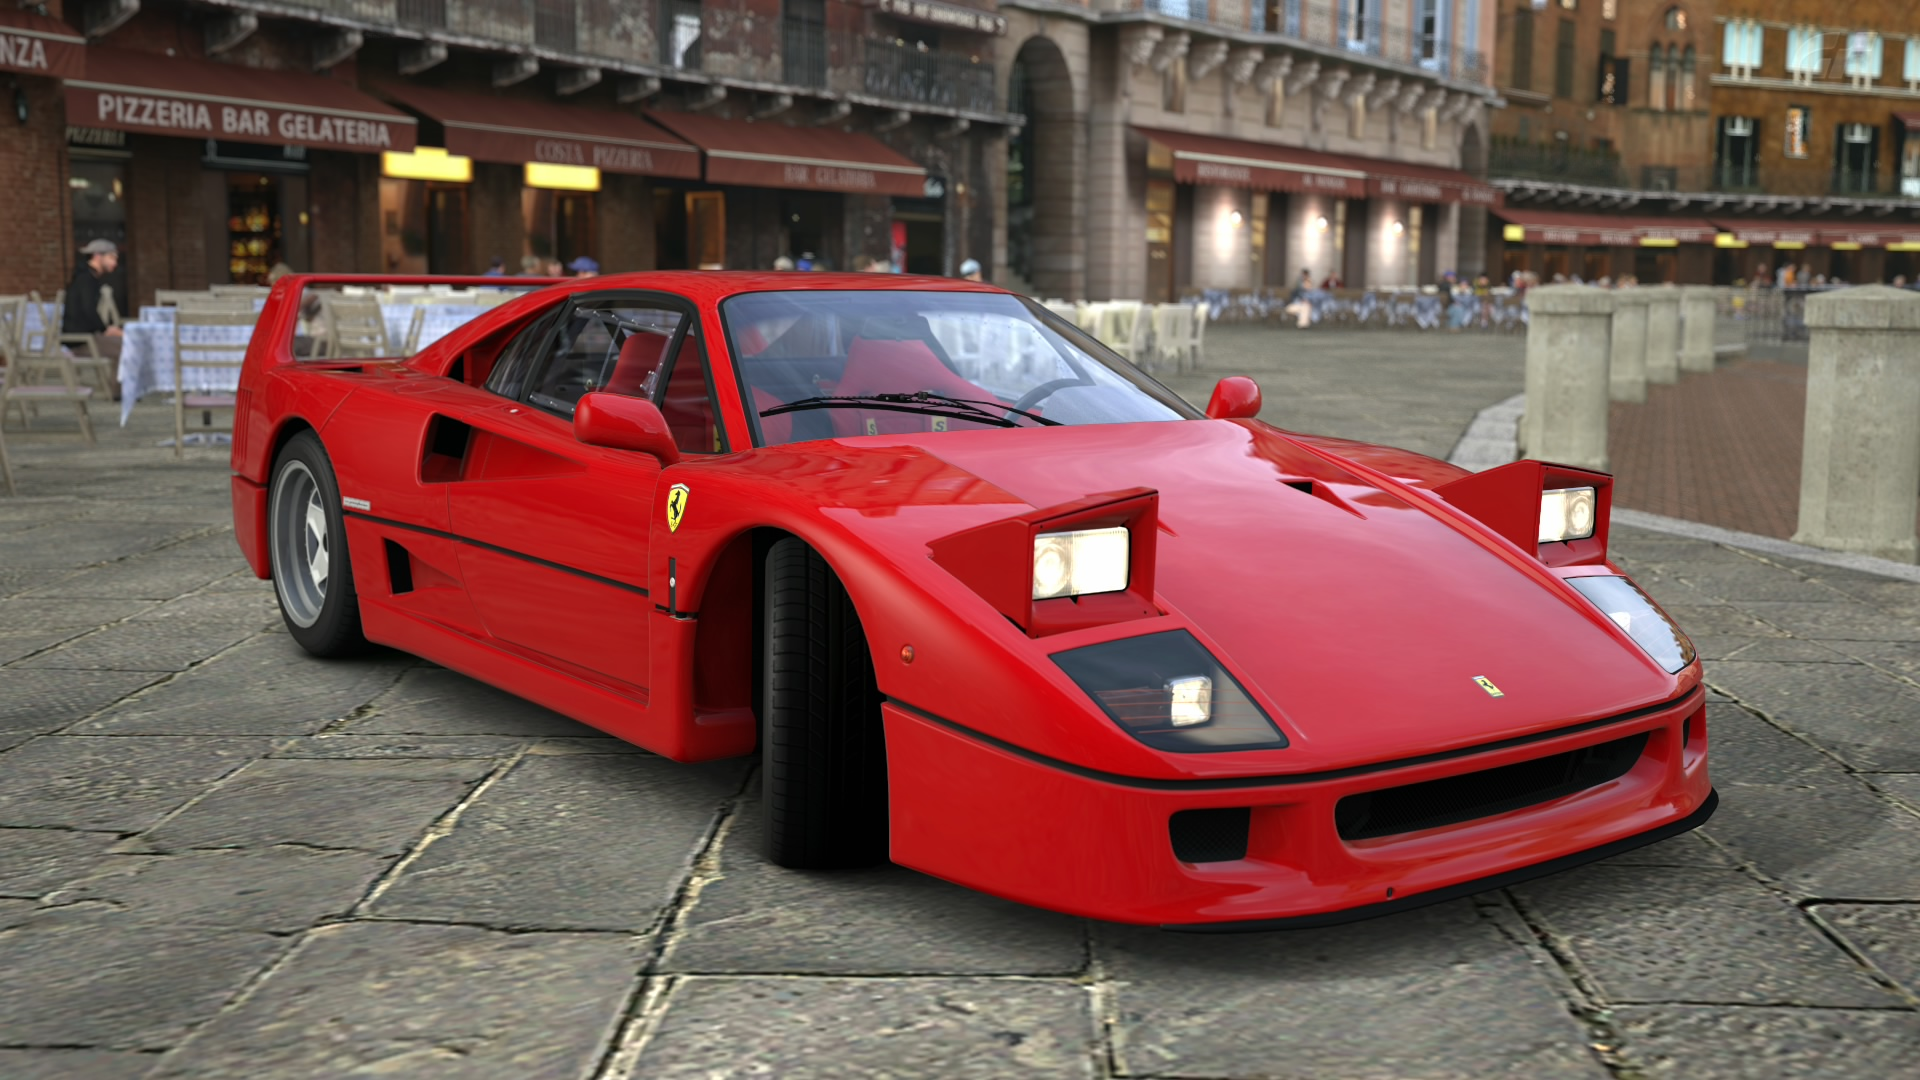 Cars With Pop Up Lights - Ferrari F40